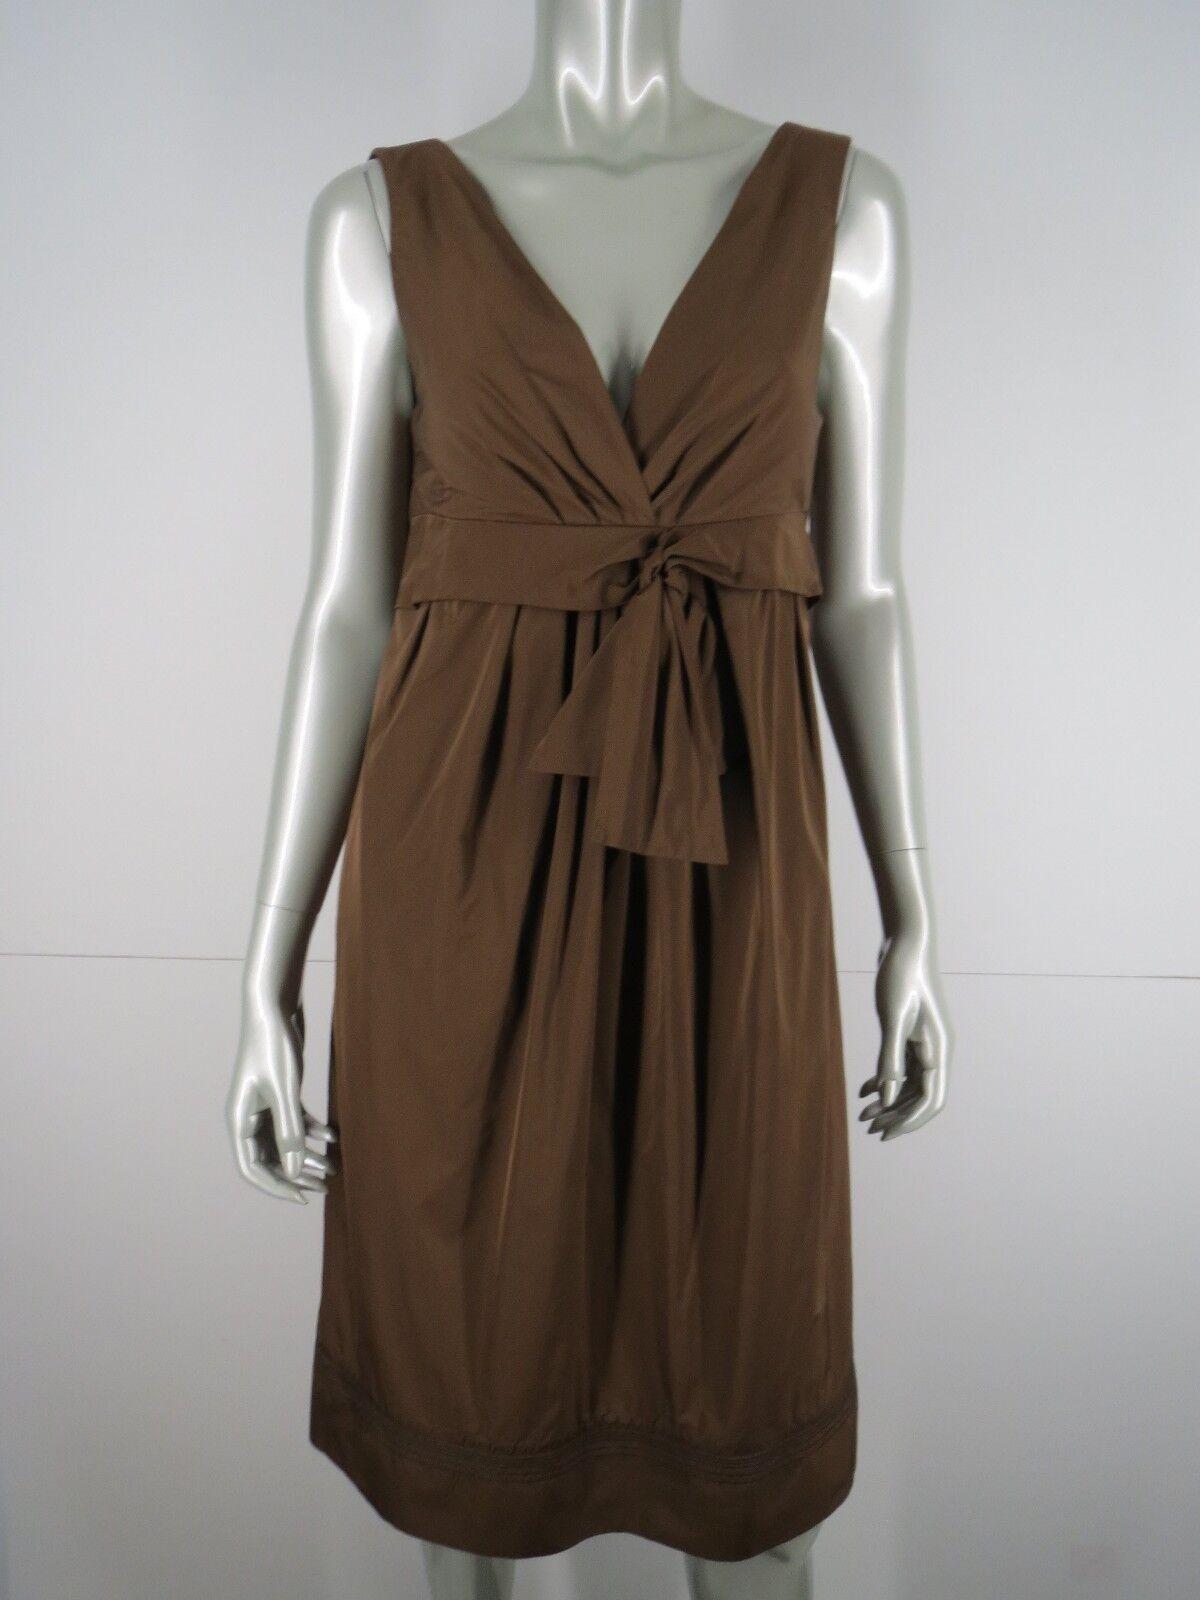 Lida Baday Dress Cocktail Party Größe 12 L Satin braun Sleeveless Ruched Sheath